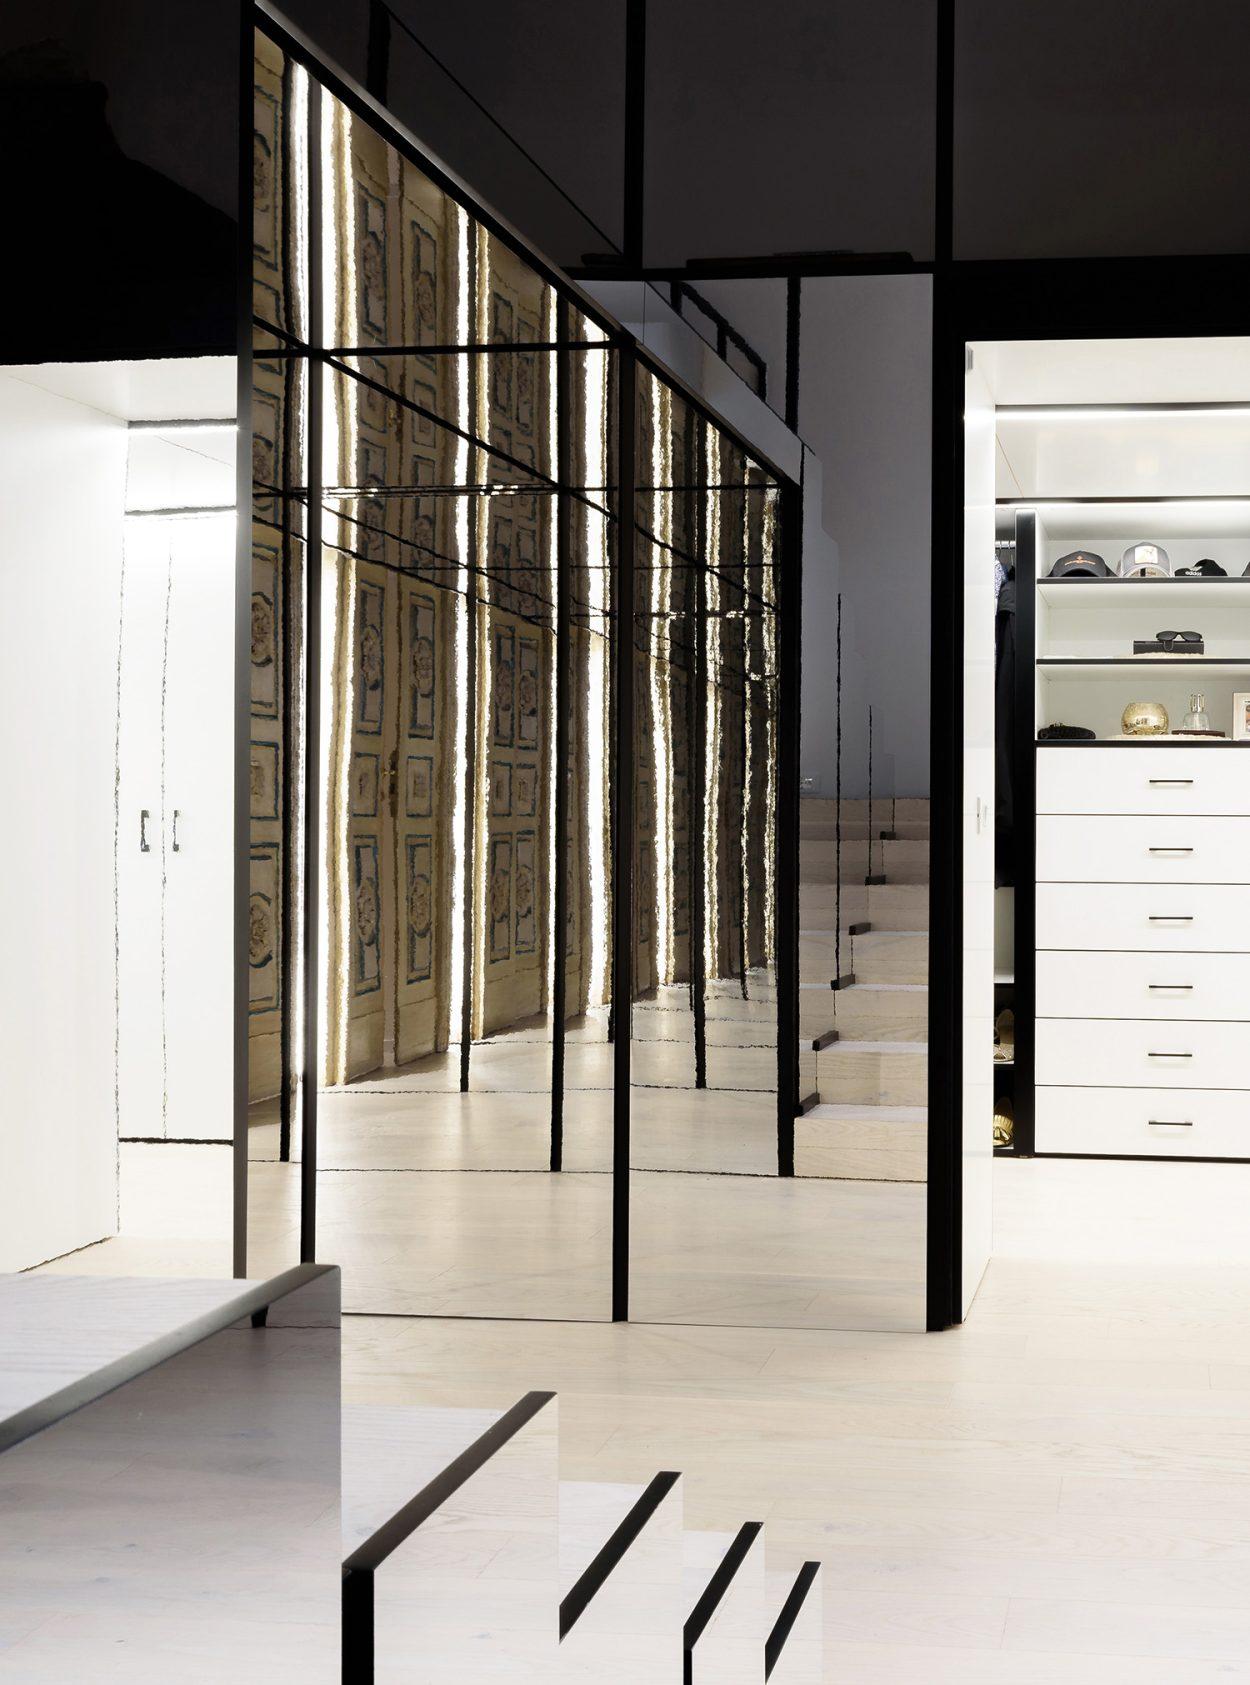 7-Ristrutturazione-Appartamento-Cesena-di-qualità-1250x1685.jpg